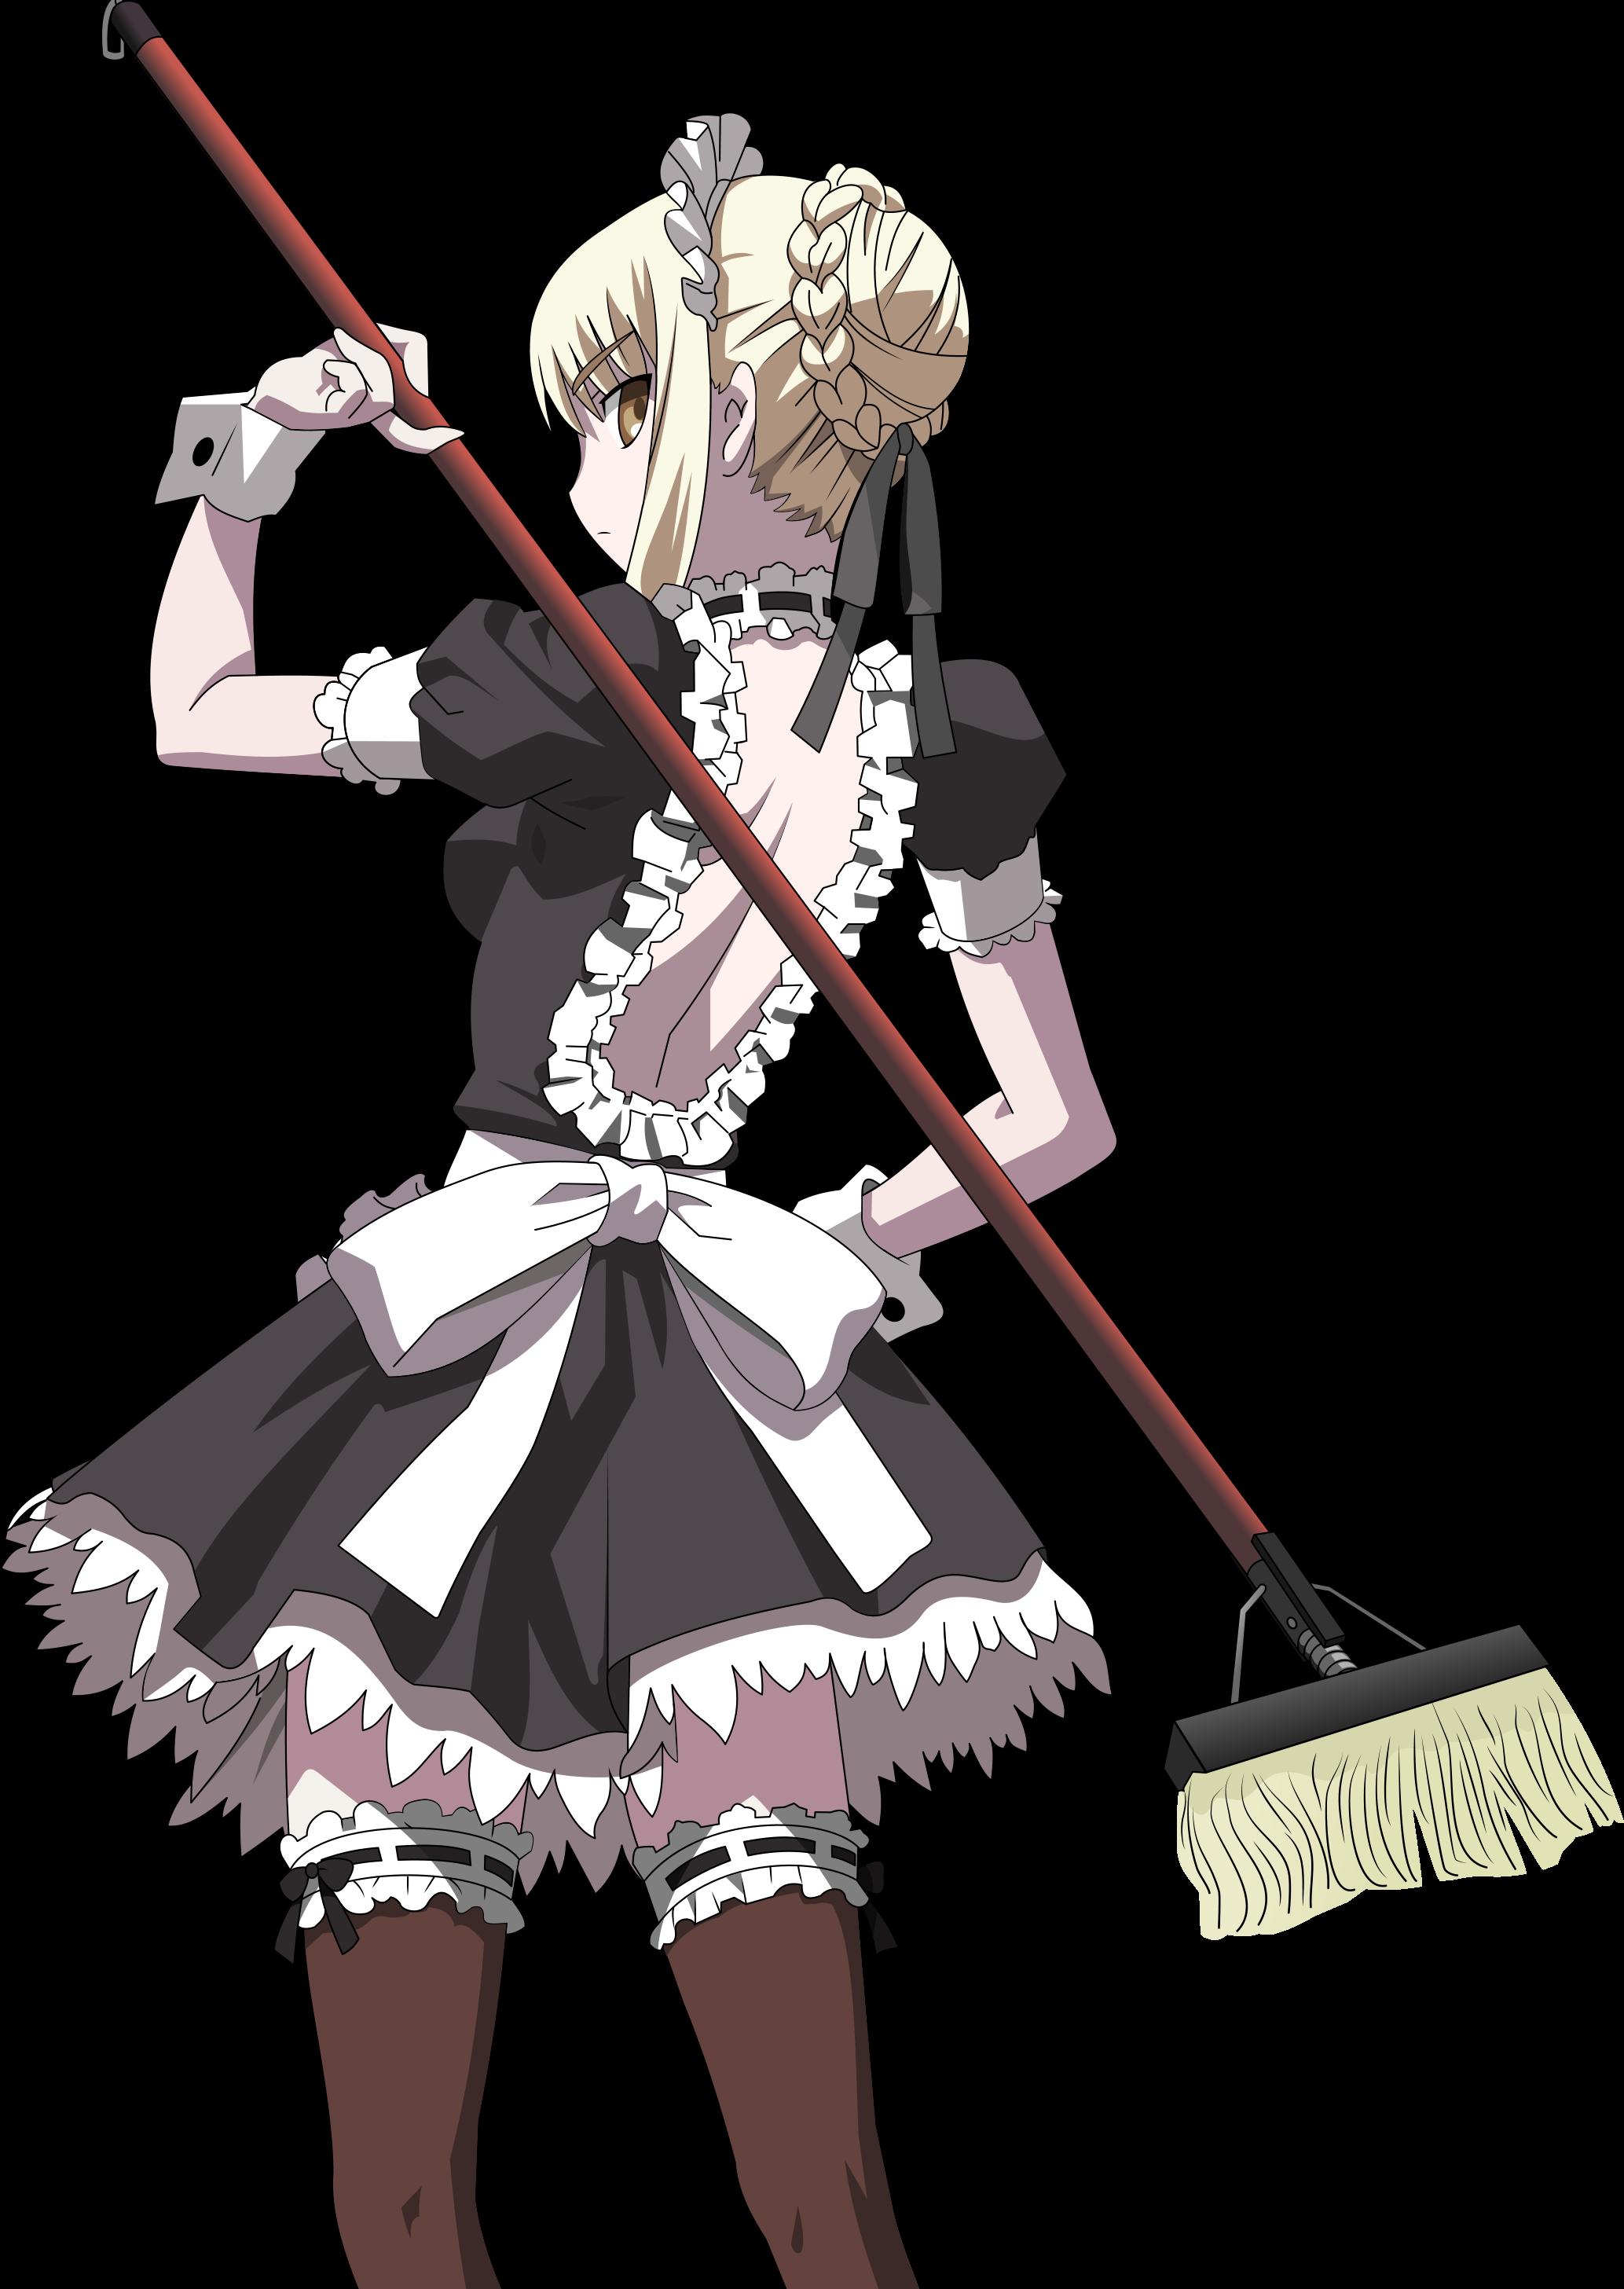 Maid clipart maid outfit. Fixed carnival phantasm postcard